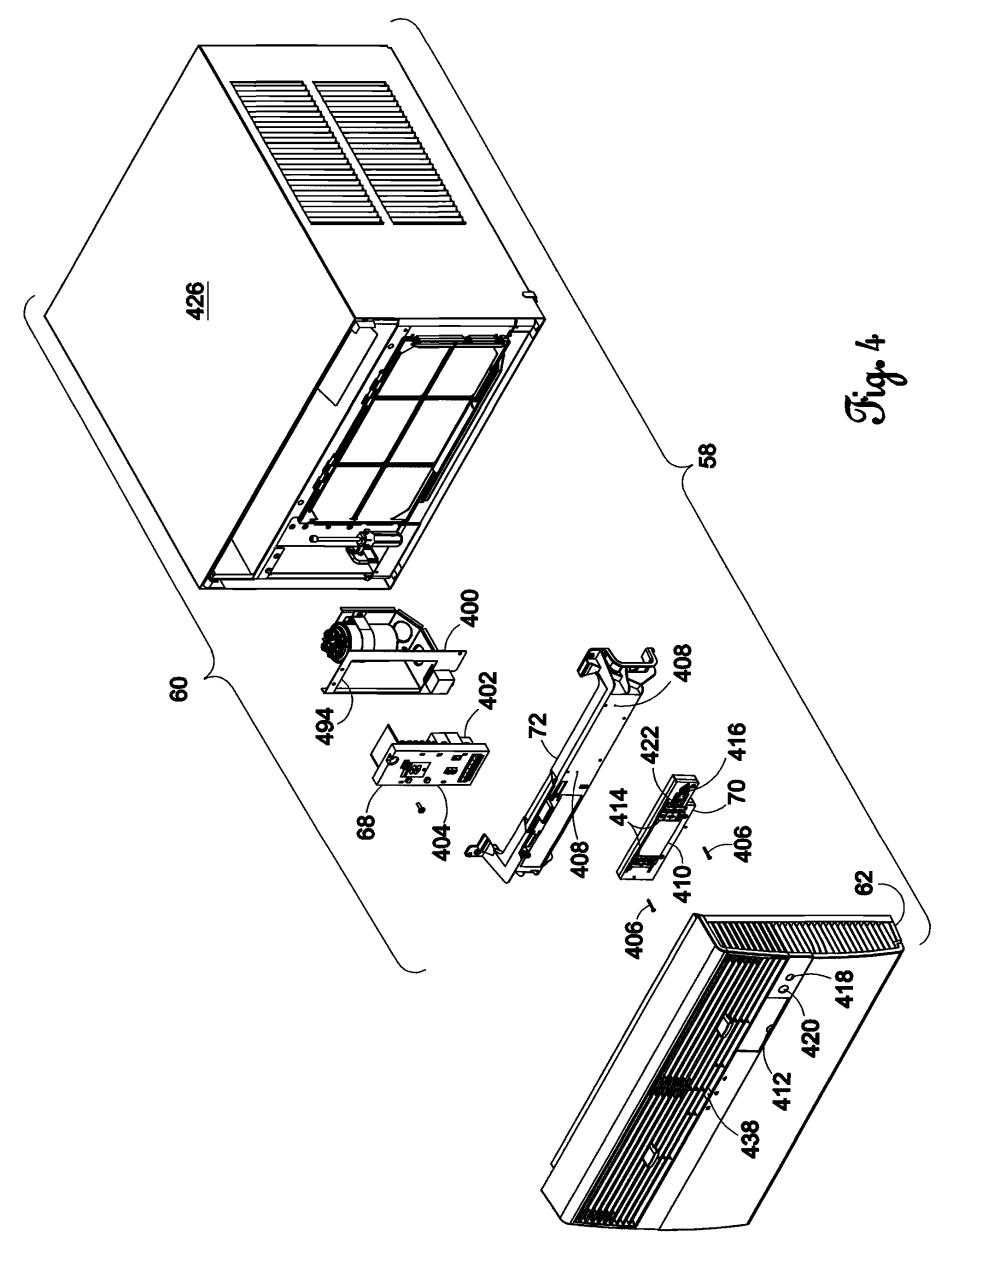 medium resolution of room air conditioner wiring diagrams autowiring mx tl crazy wiring issue wiring gurus helpz20diagramjpg